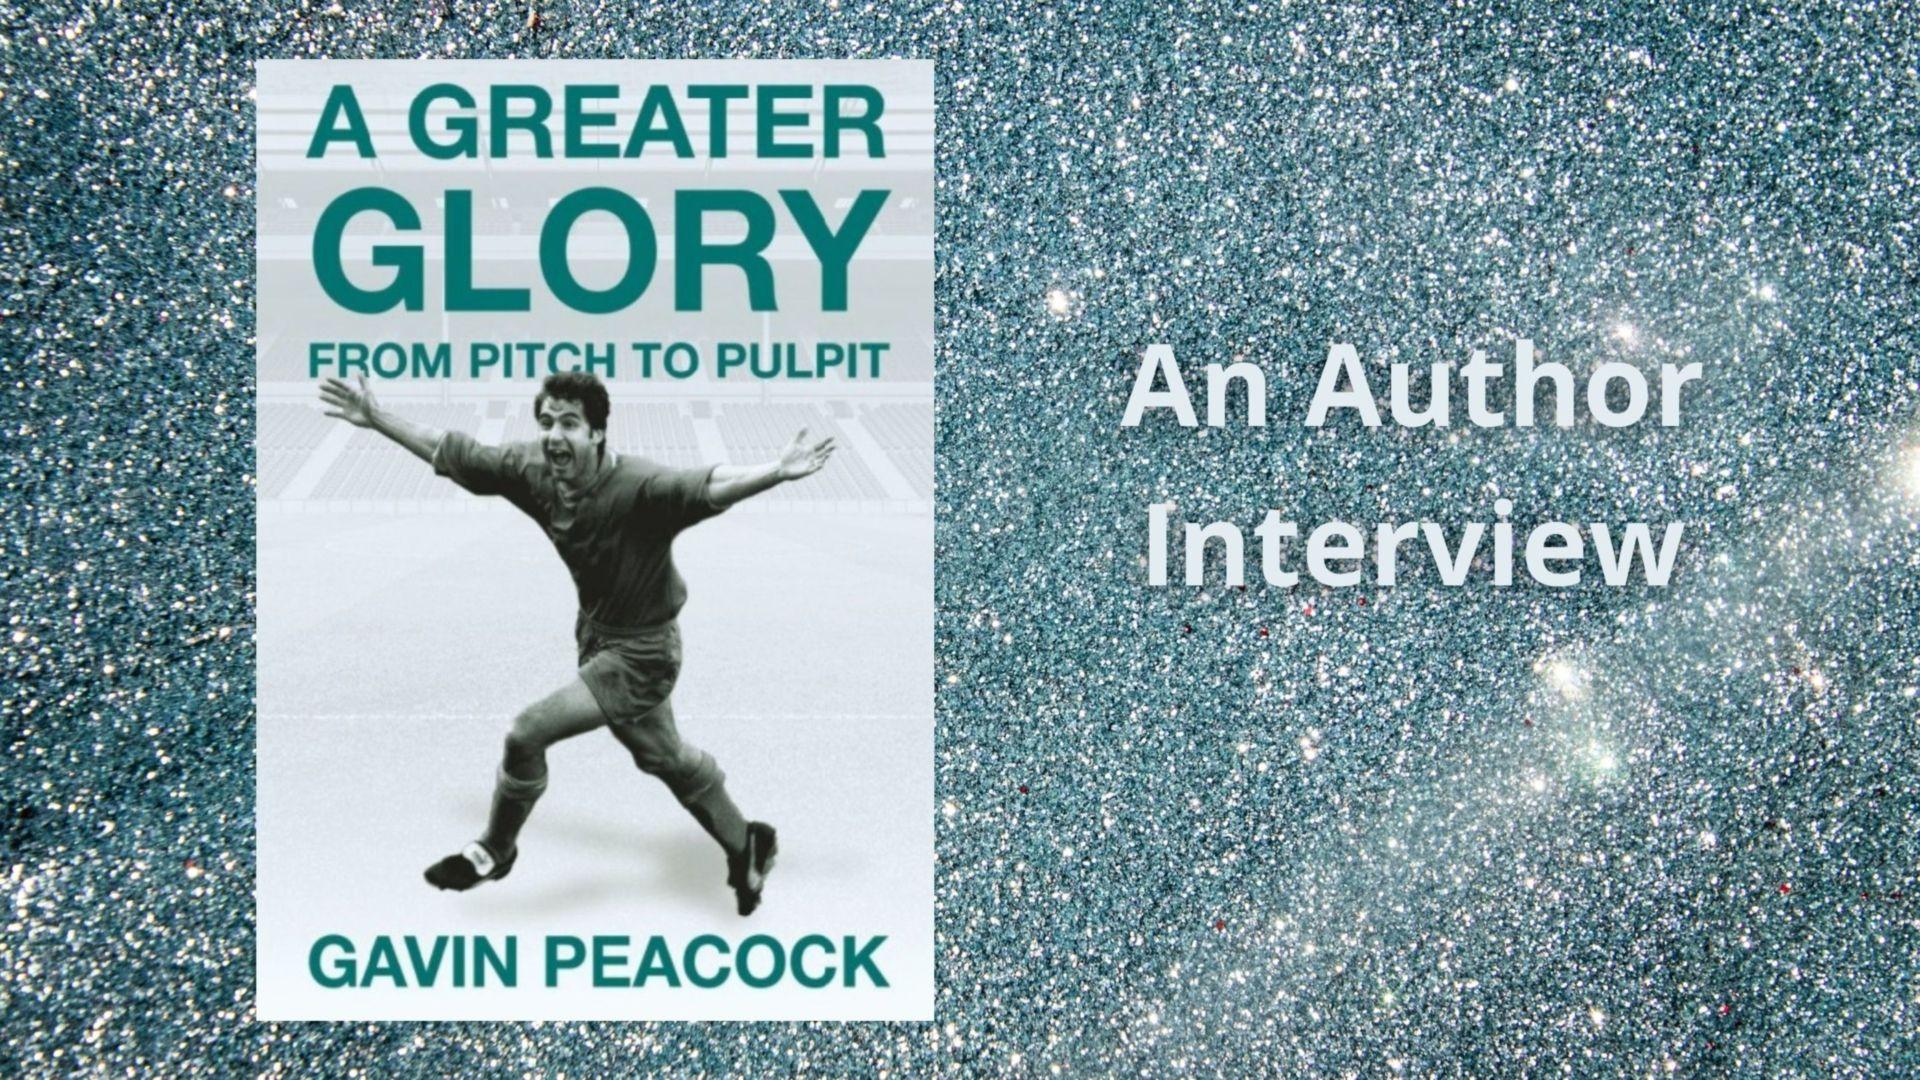 A book by former footballer Gavin Peacock - 'A Greater Glory'